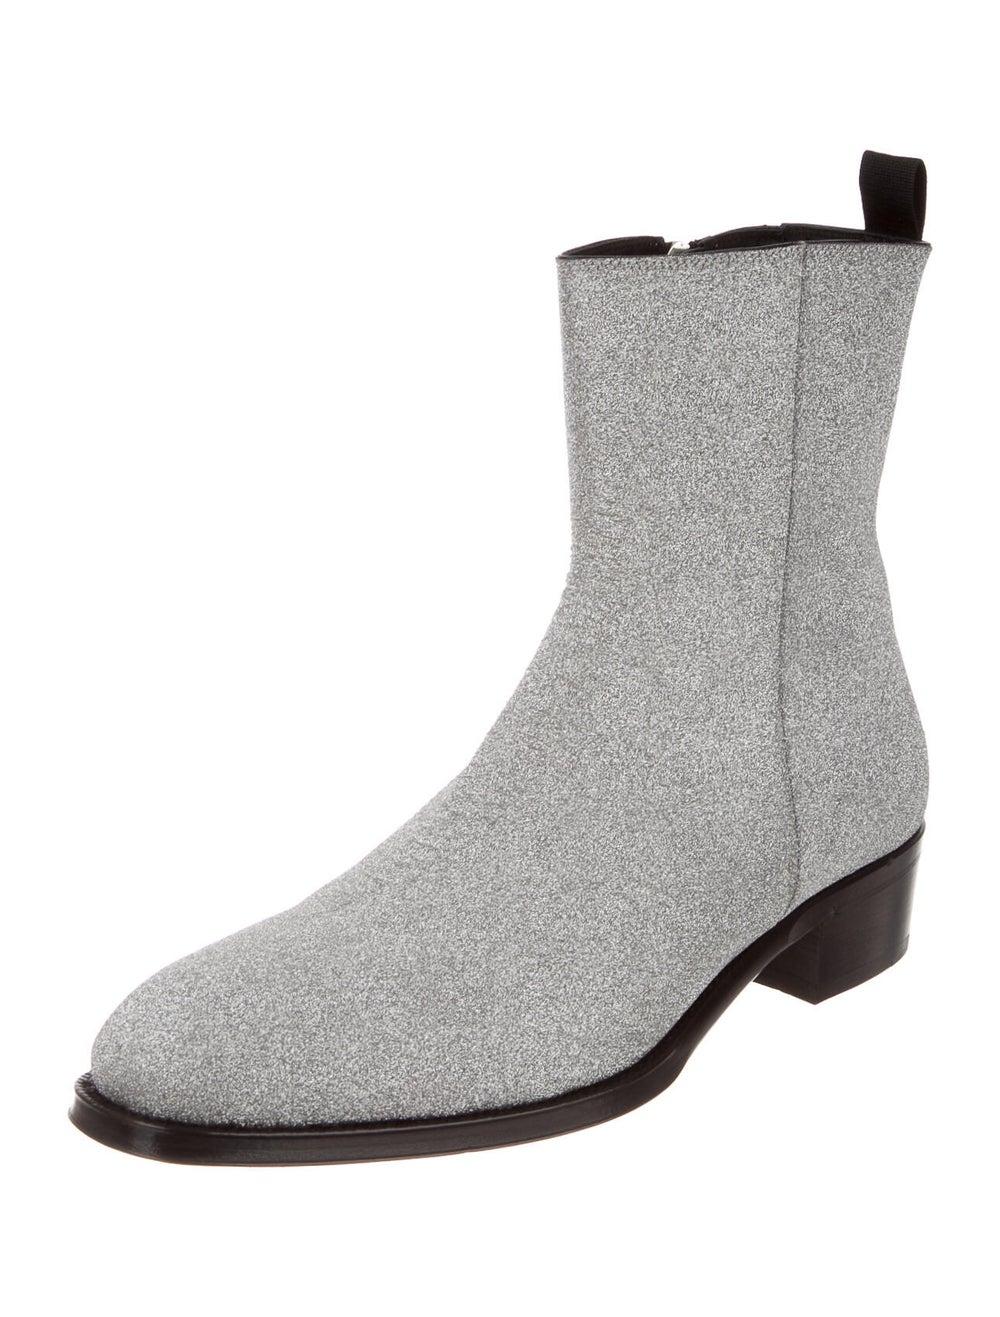 Alexander McQueen Boots Silver - image 2